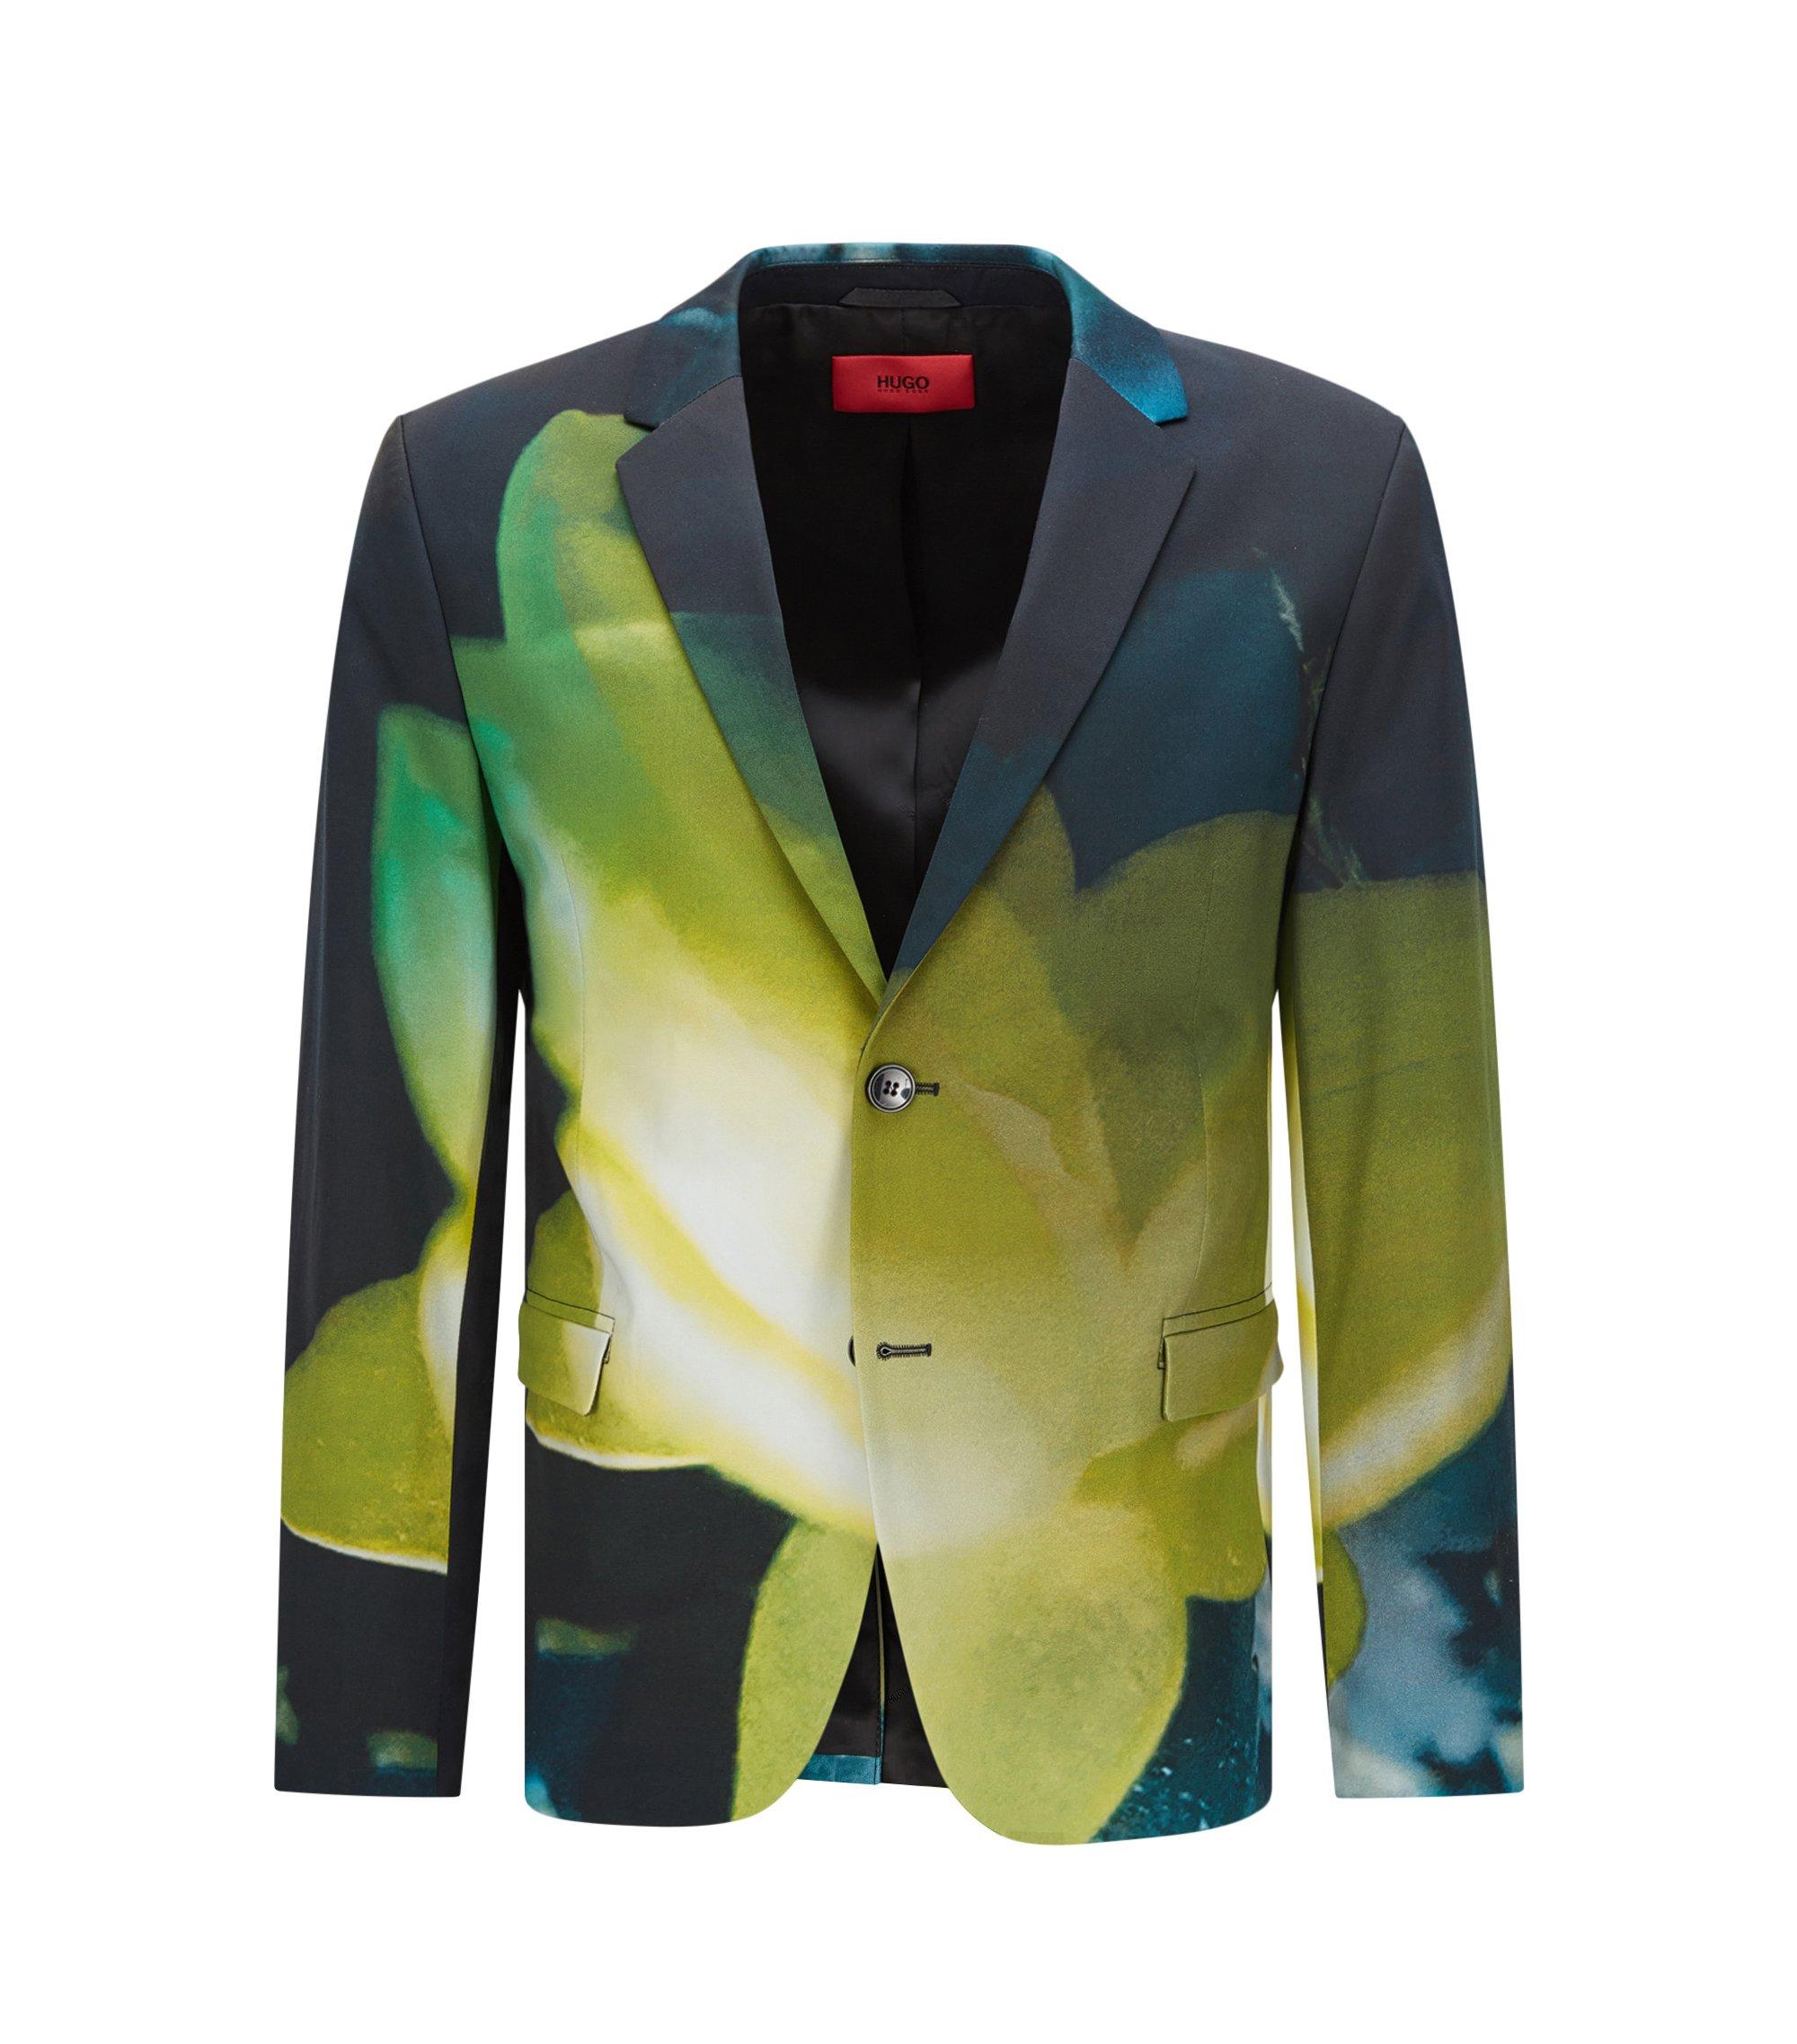 Stretch Cotton Sport Coat, Slim Fit   Arelto, Patterned